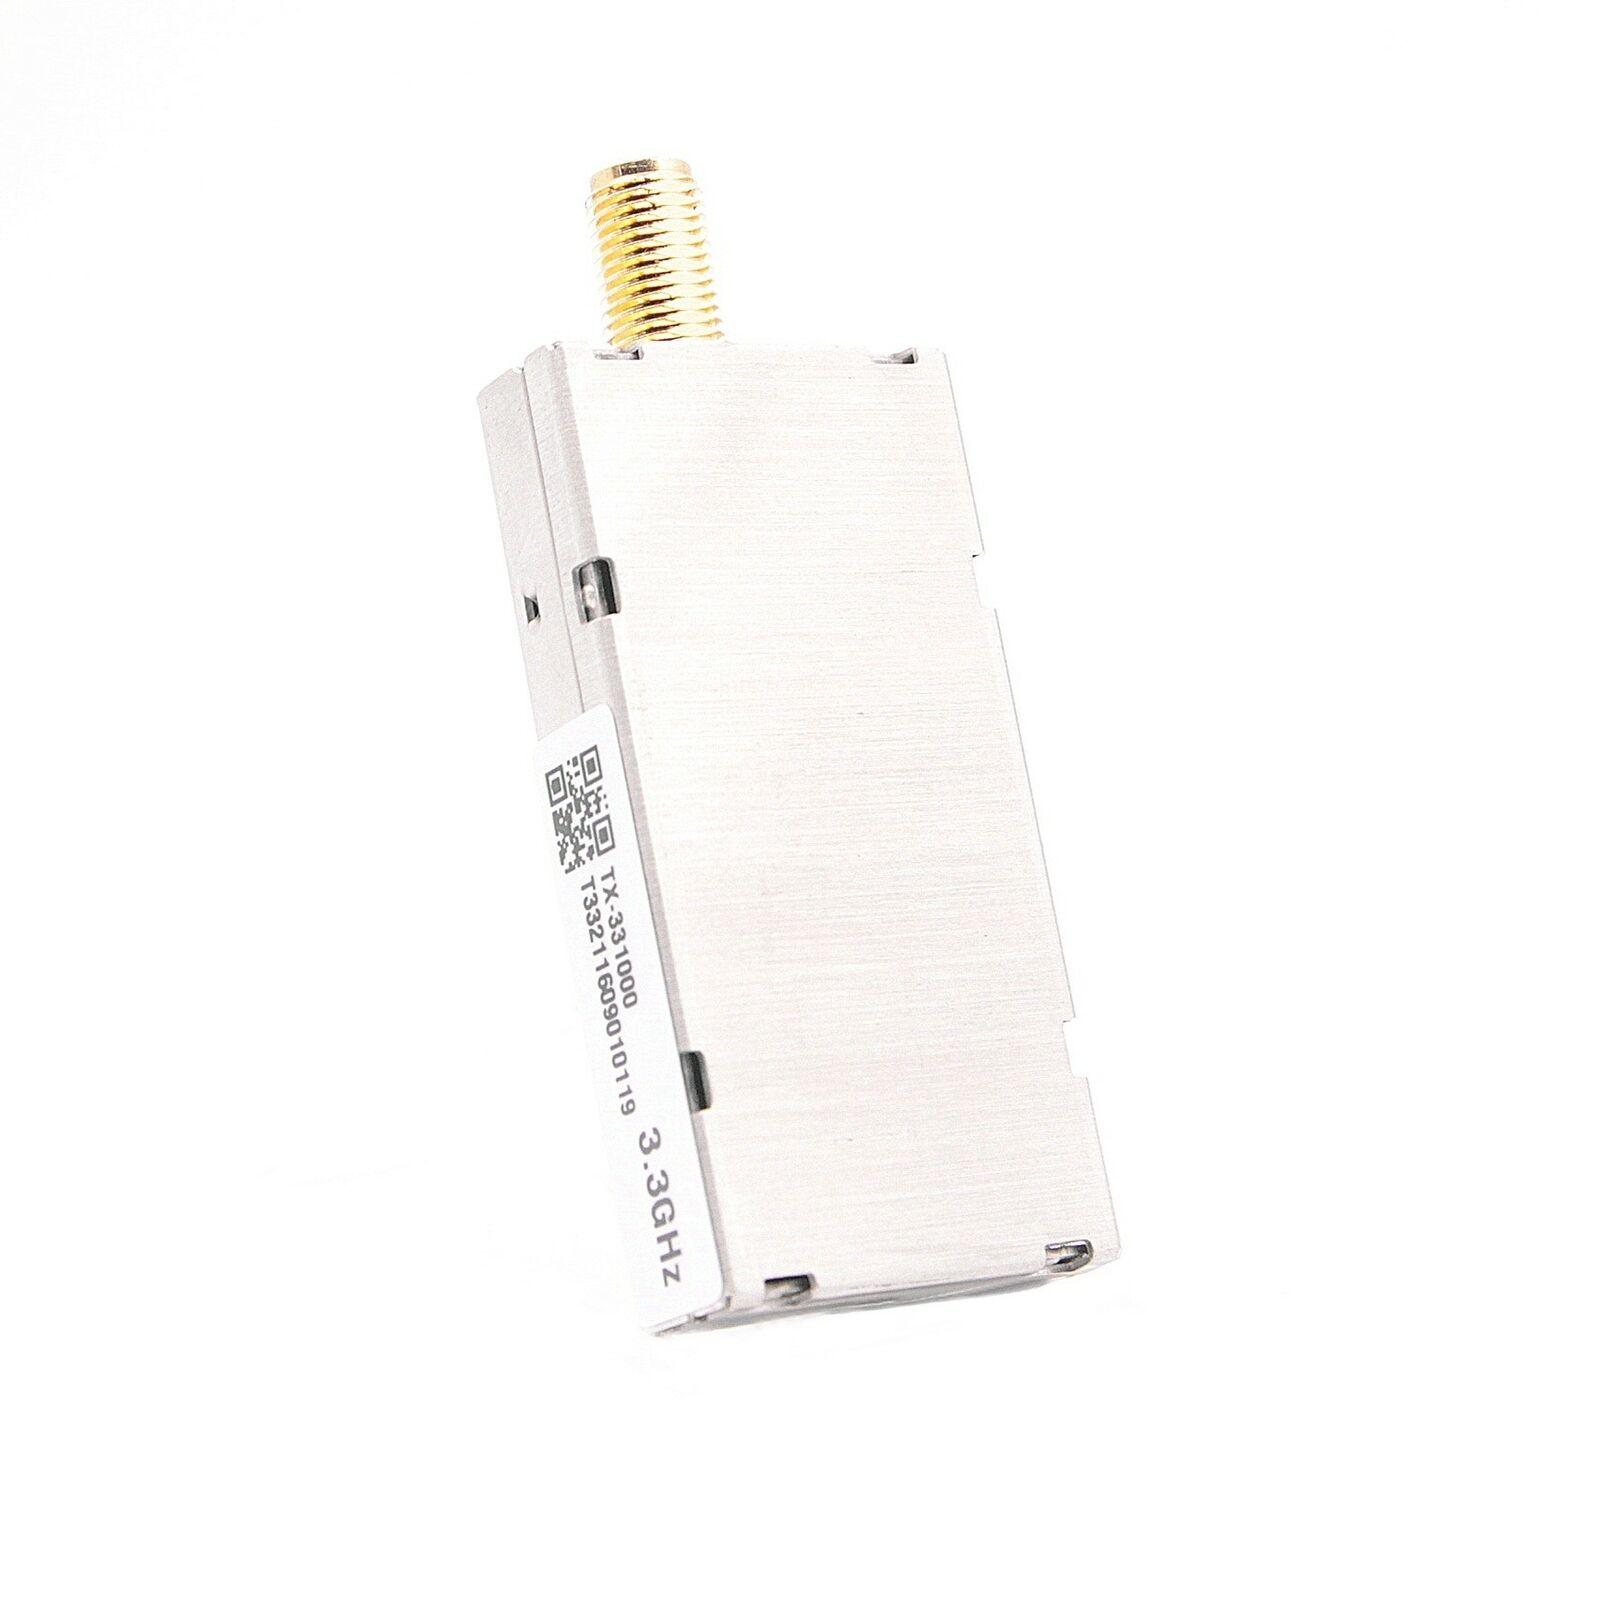 3.3GHz 8CH 1W KIT FPV Trasmettitore Ricevitore Ricevitore Ricevitore per FPV CCTV TM-331000 TX + RX TPYS 786bda